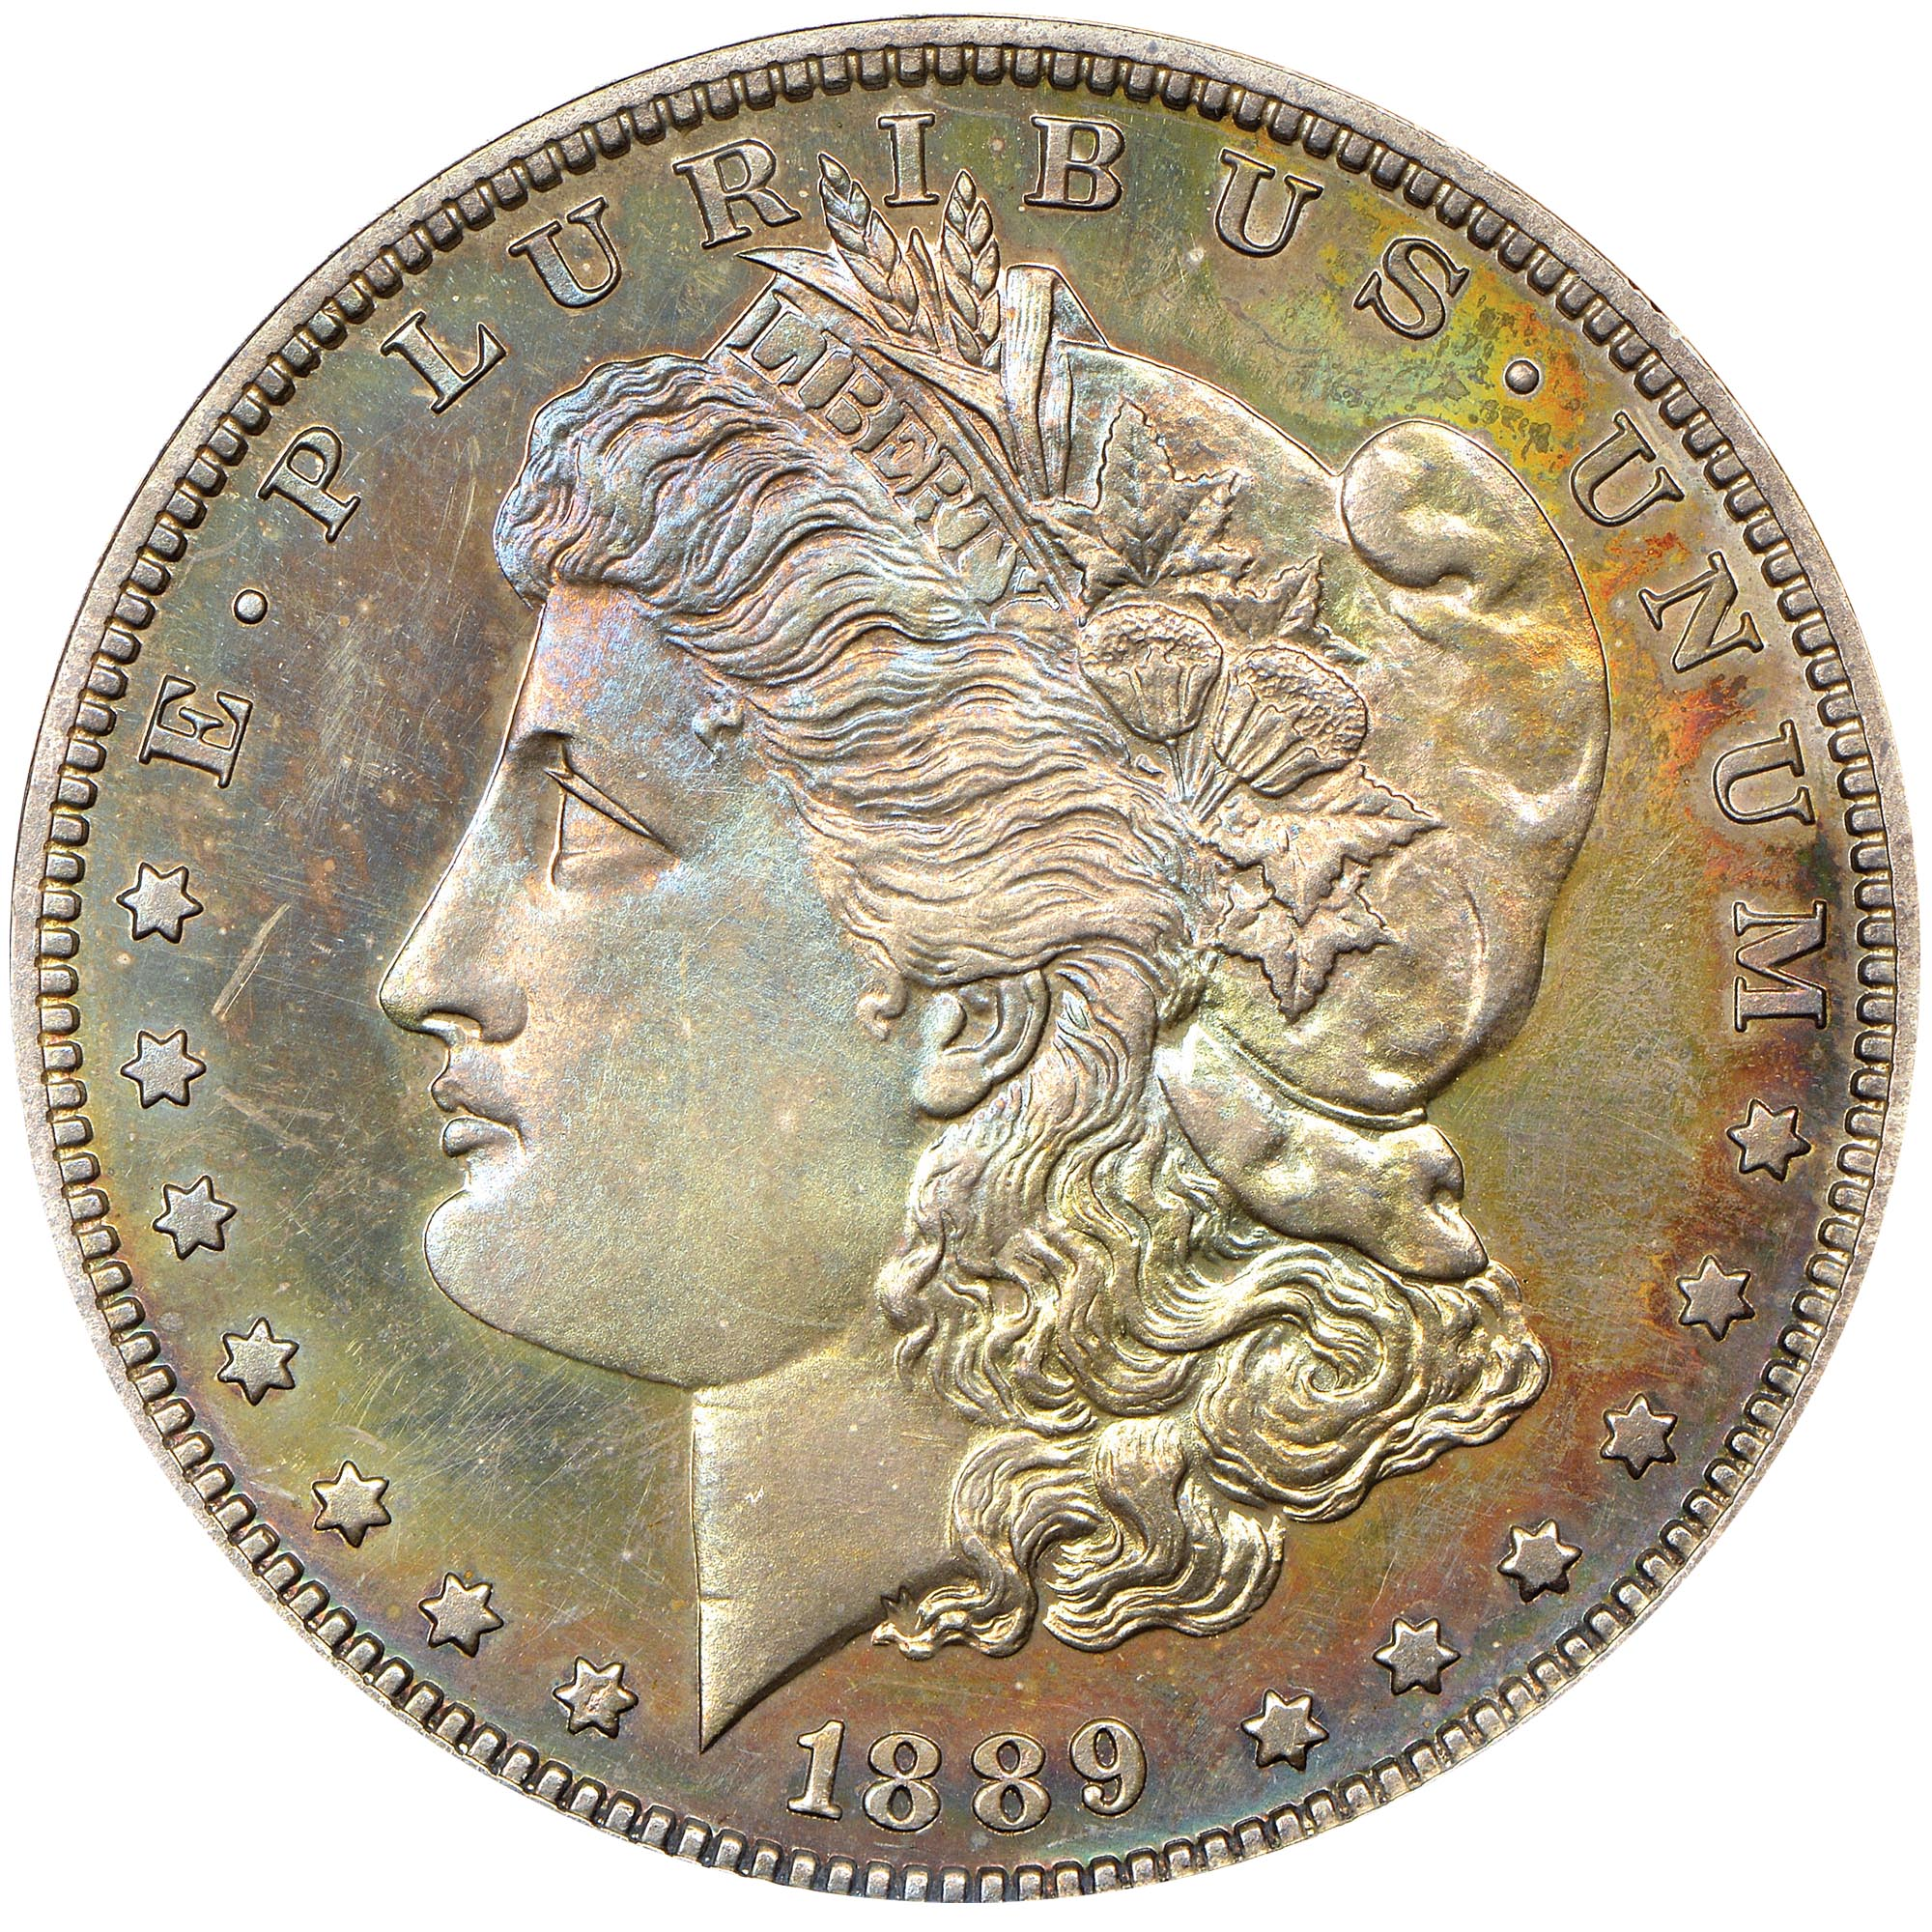 1889 1 Pf Morgan Dollars Ngc